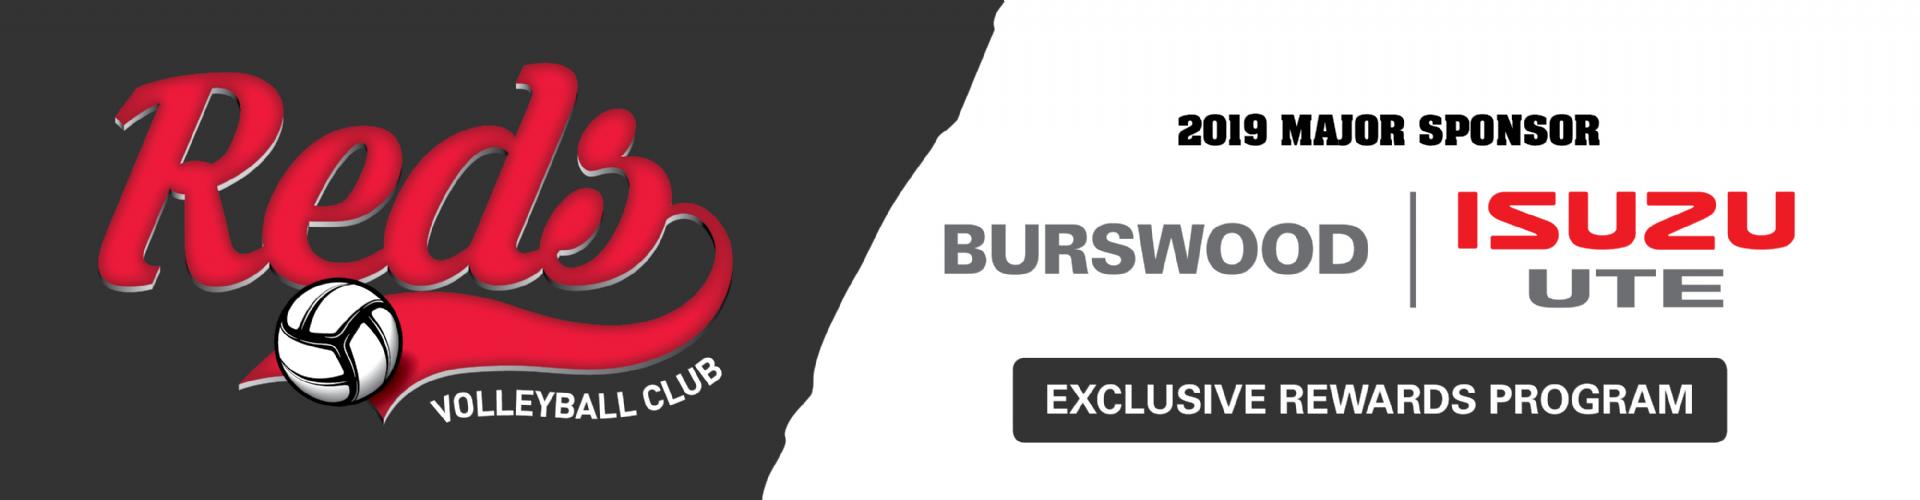 BurswoodIsuzu-landingbanner